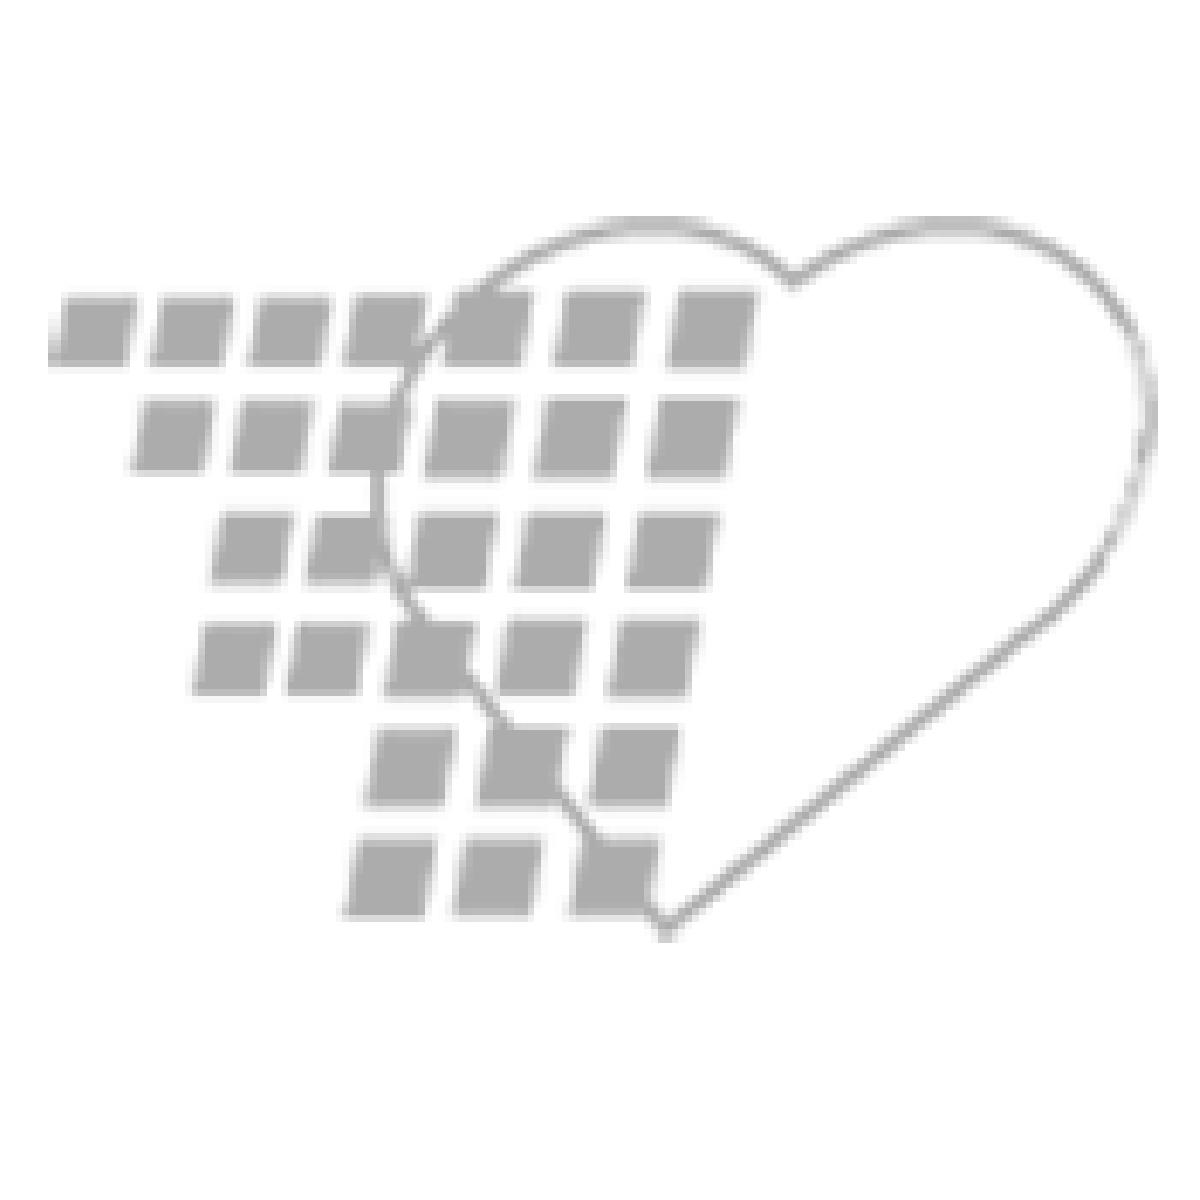 02-49-6415 Hemoccult Sensa Rapid Diagnostic Test Kit Single Slides Fecal Occult Blood Test (FOB)